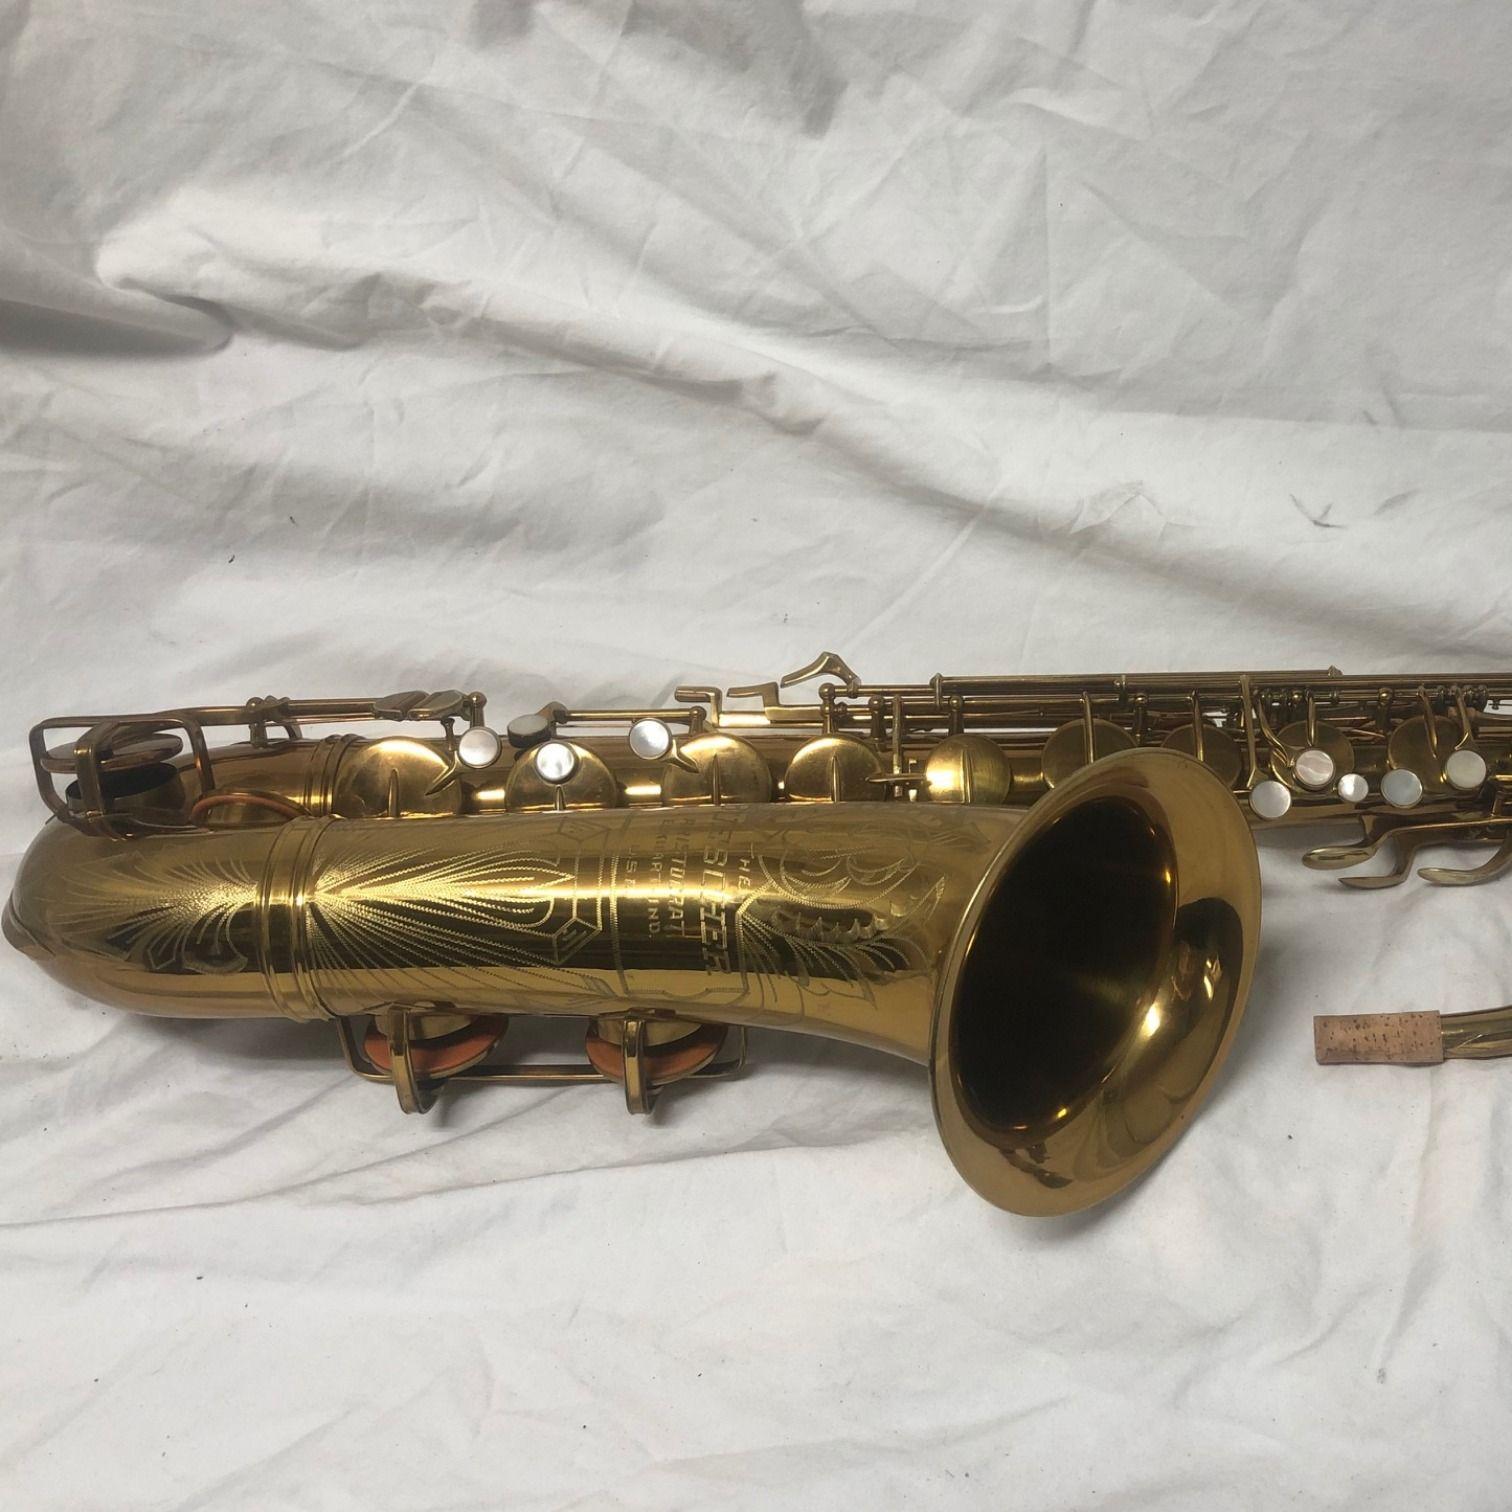 Buescher Big B Aristocrat vintage tenor sax features original